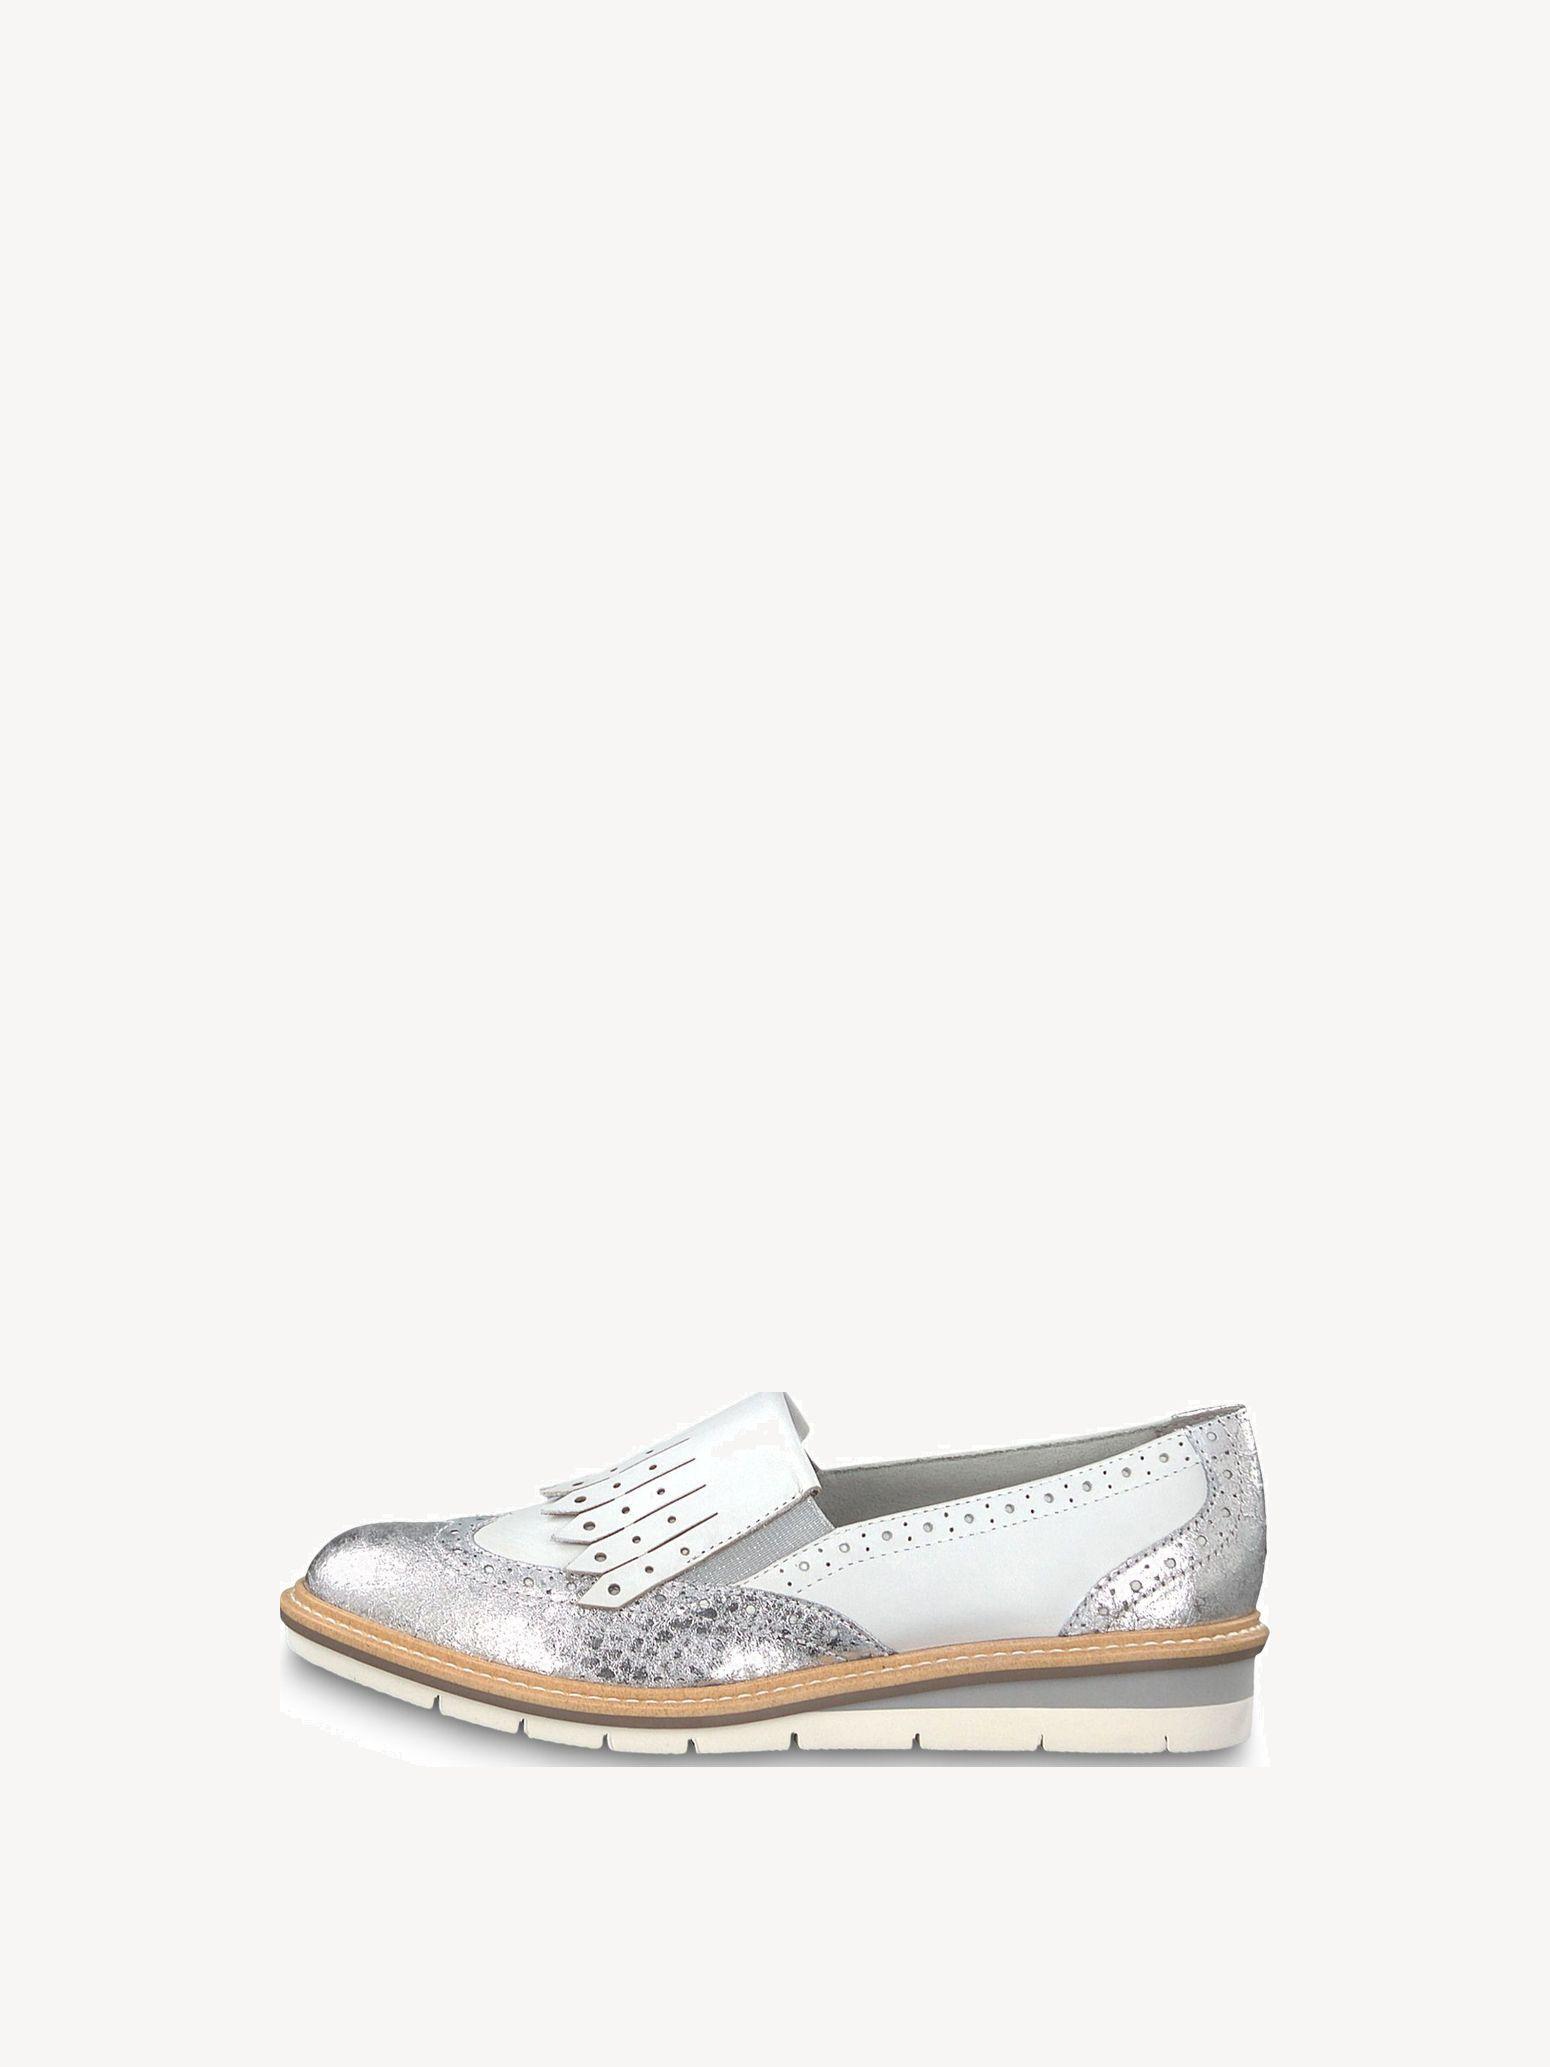 Kela Chaussure basse